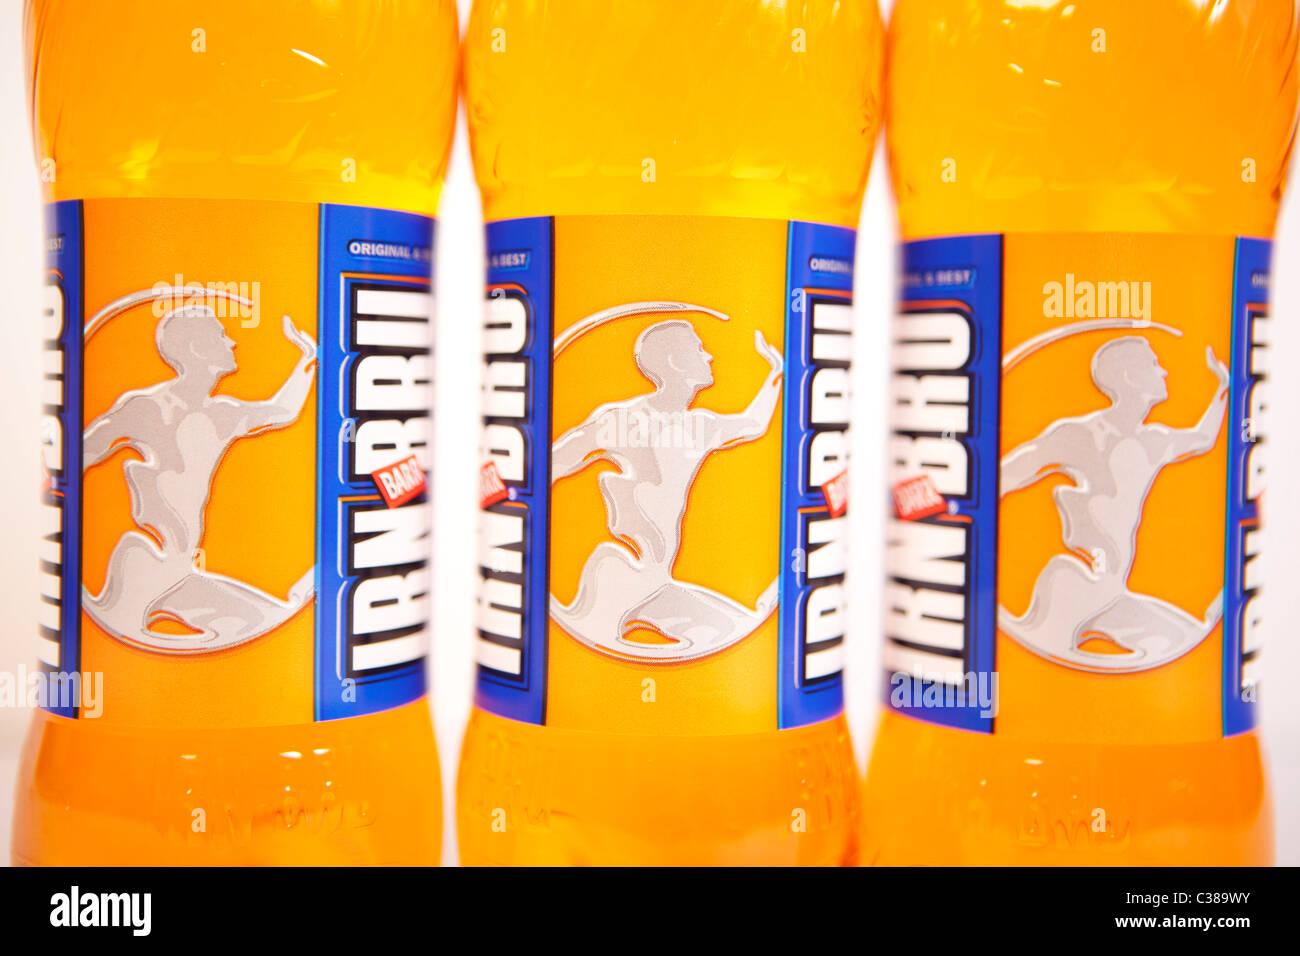 Illustrative image of Irn Bru bottles. - Stock Image